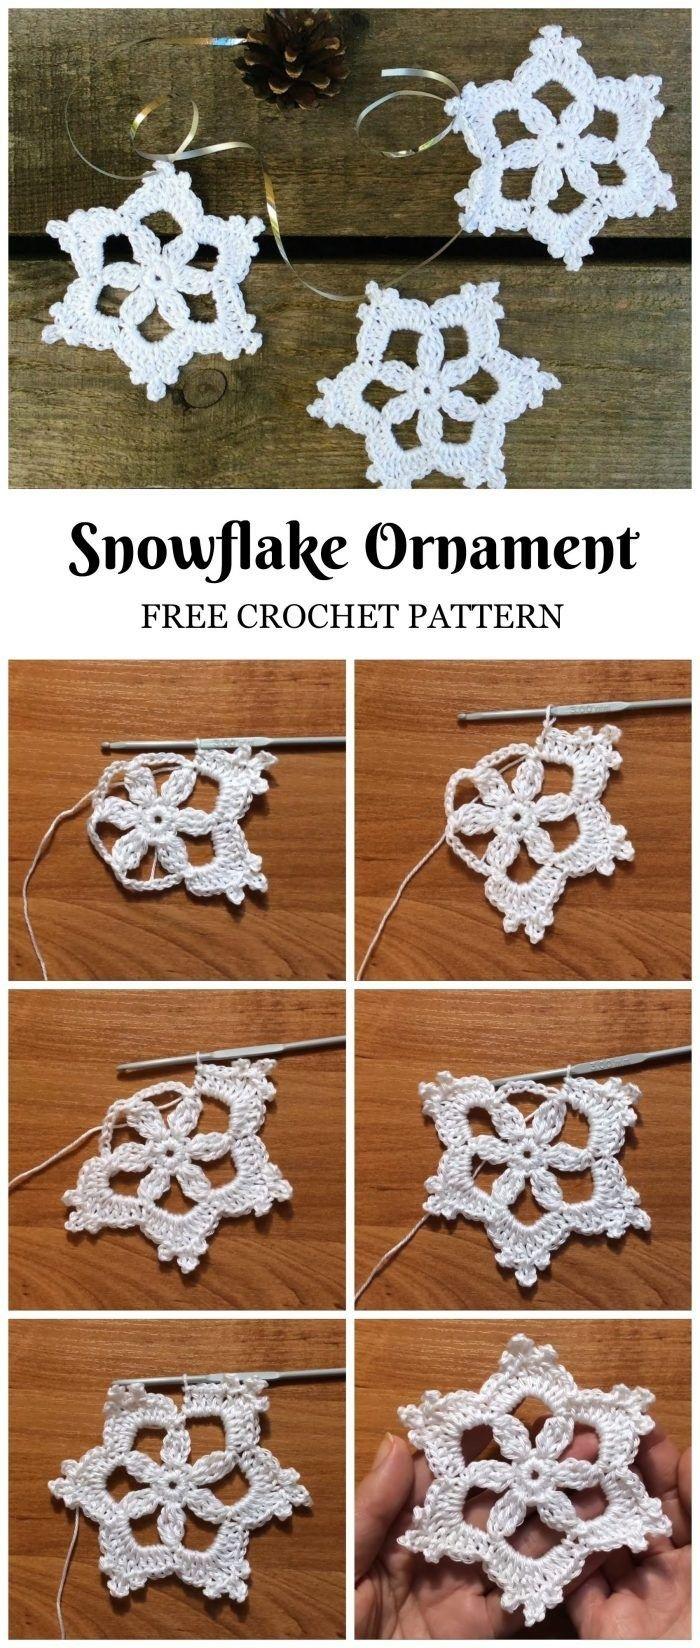 Crochet Snowflake Patterns Crochet Snowflake Patterns For Beginners Trendcrochets Com Crochet Snowflake Pattern Christmas Crochet Patterns Crochet Snowflakes